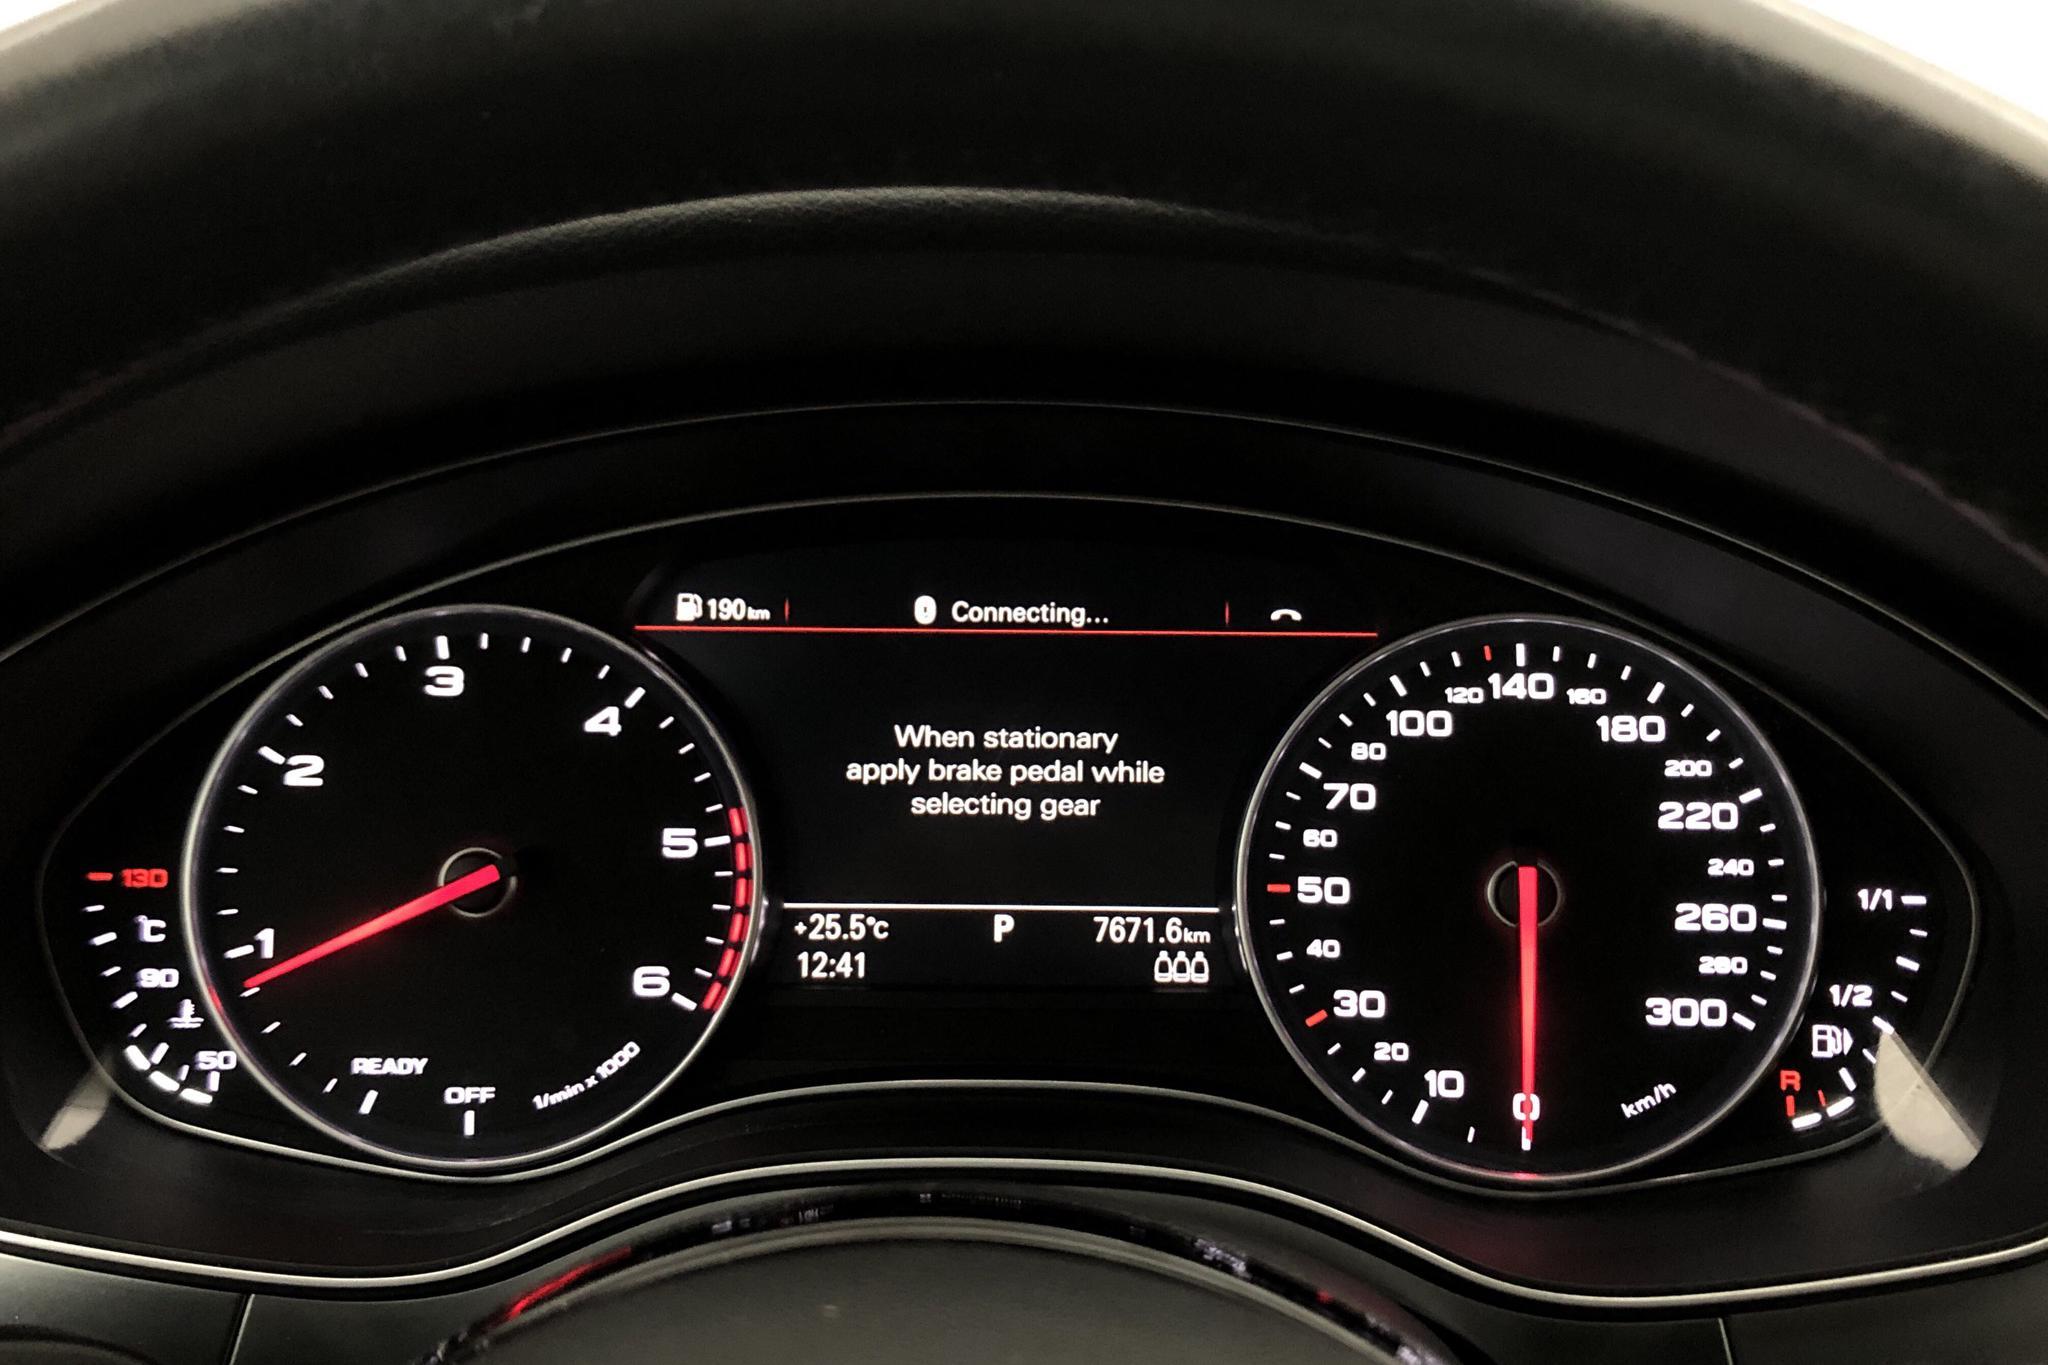 Audi A6 2.0 TDI Avant (190hk) - 53 470 km - Automatic - gray - 2016